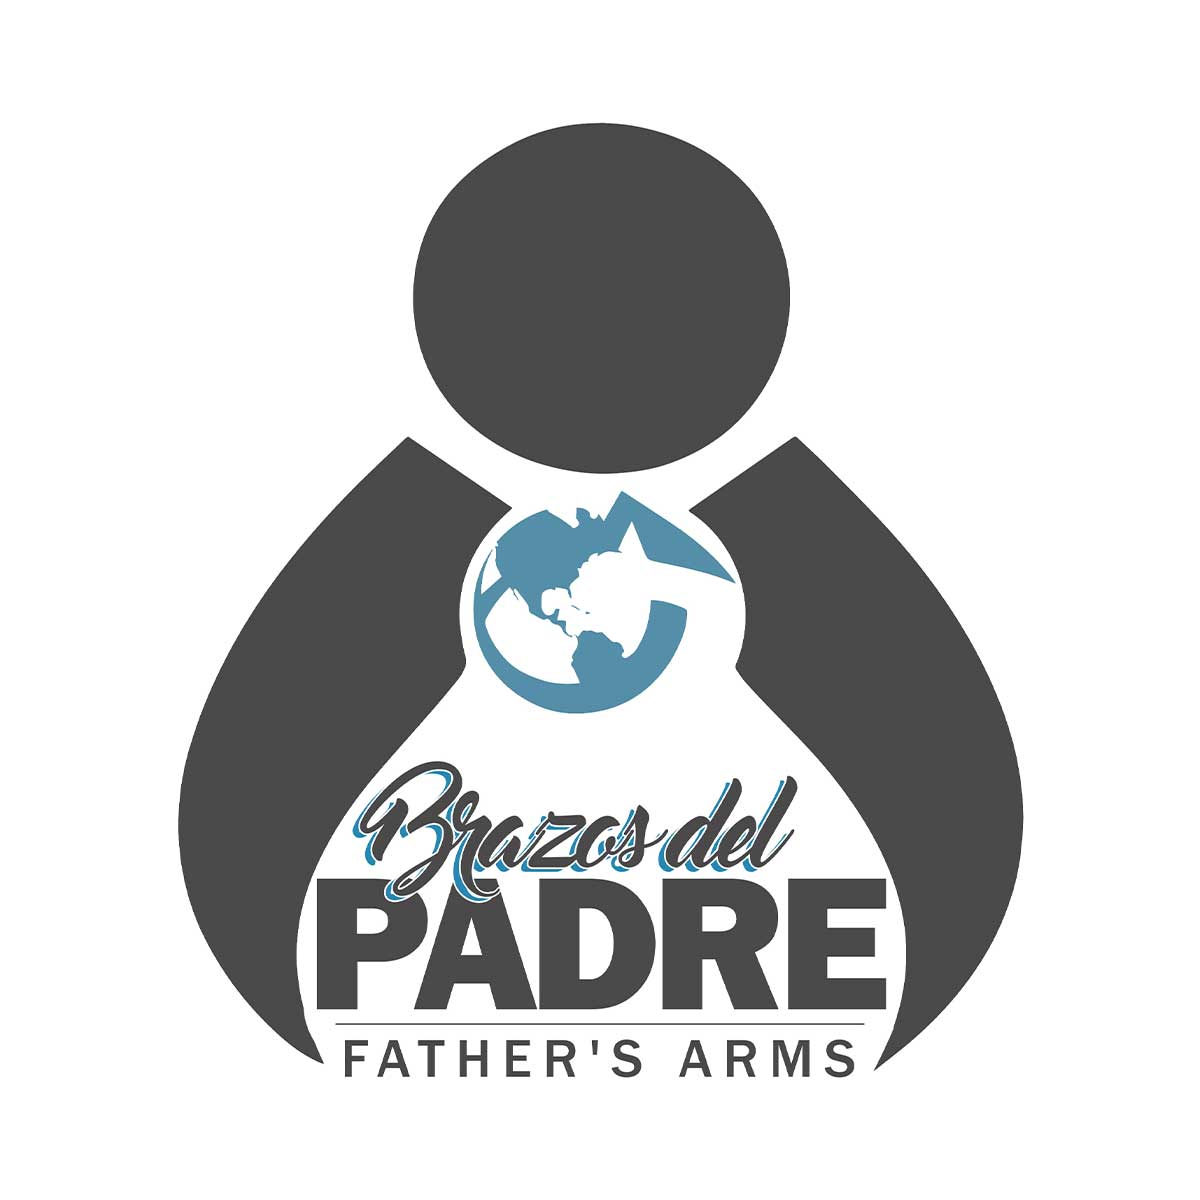 Father'sArms.jpg